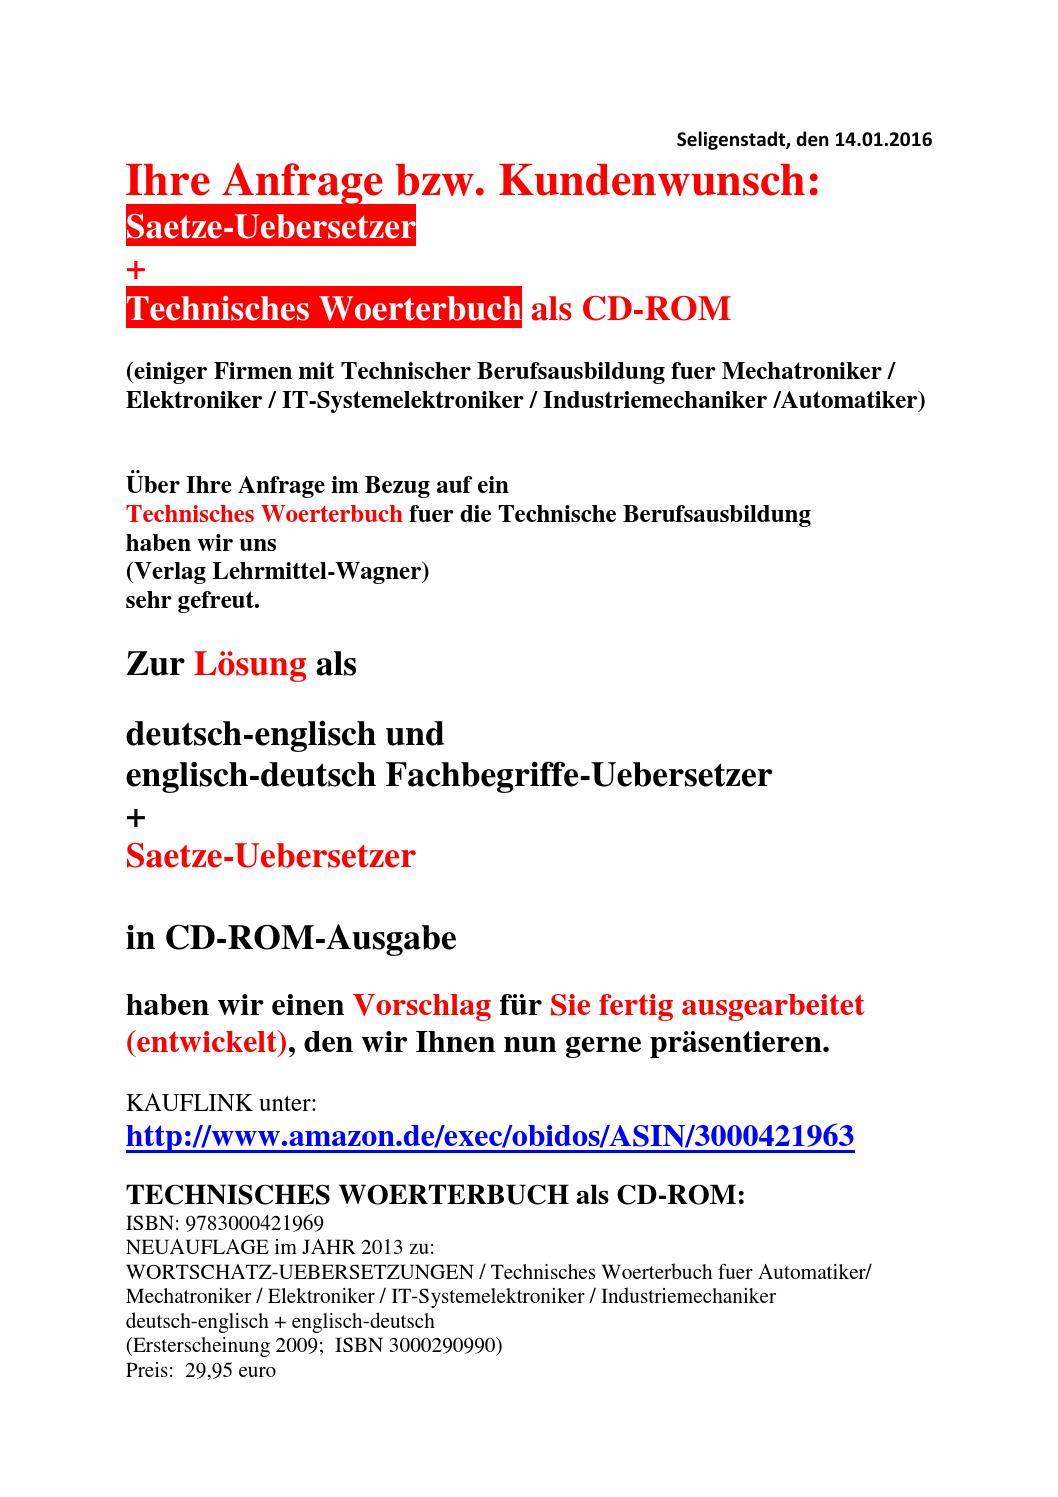 Wunsch der mechatronik azubis deutsch englisch saetze for Ubersetzung englisch deutsch text